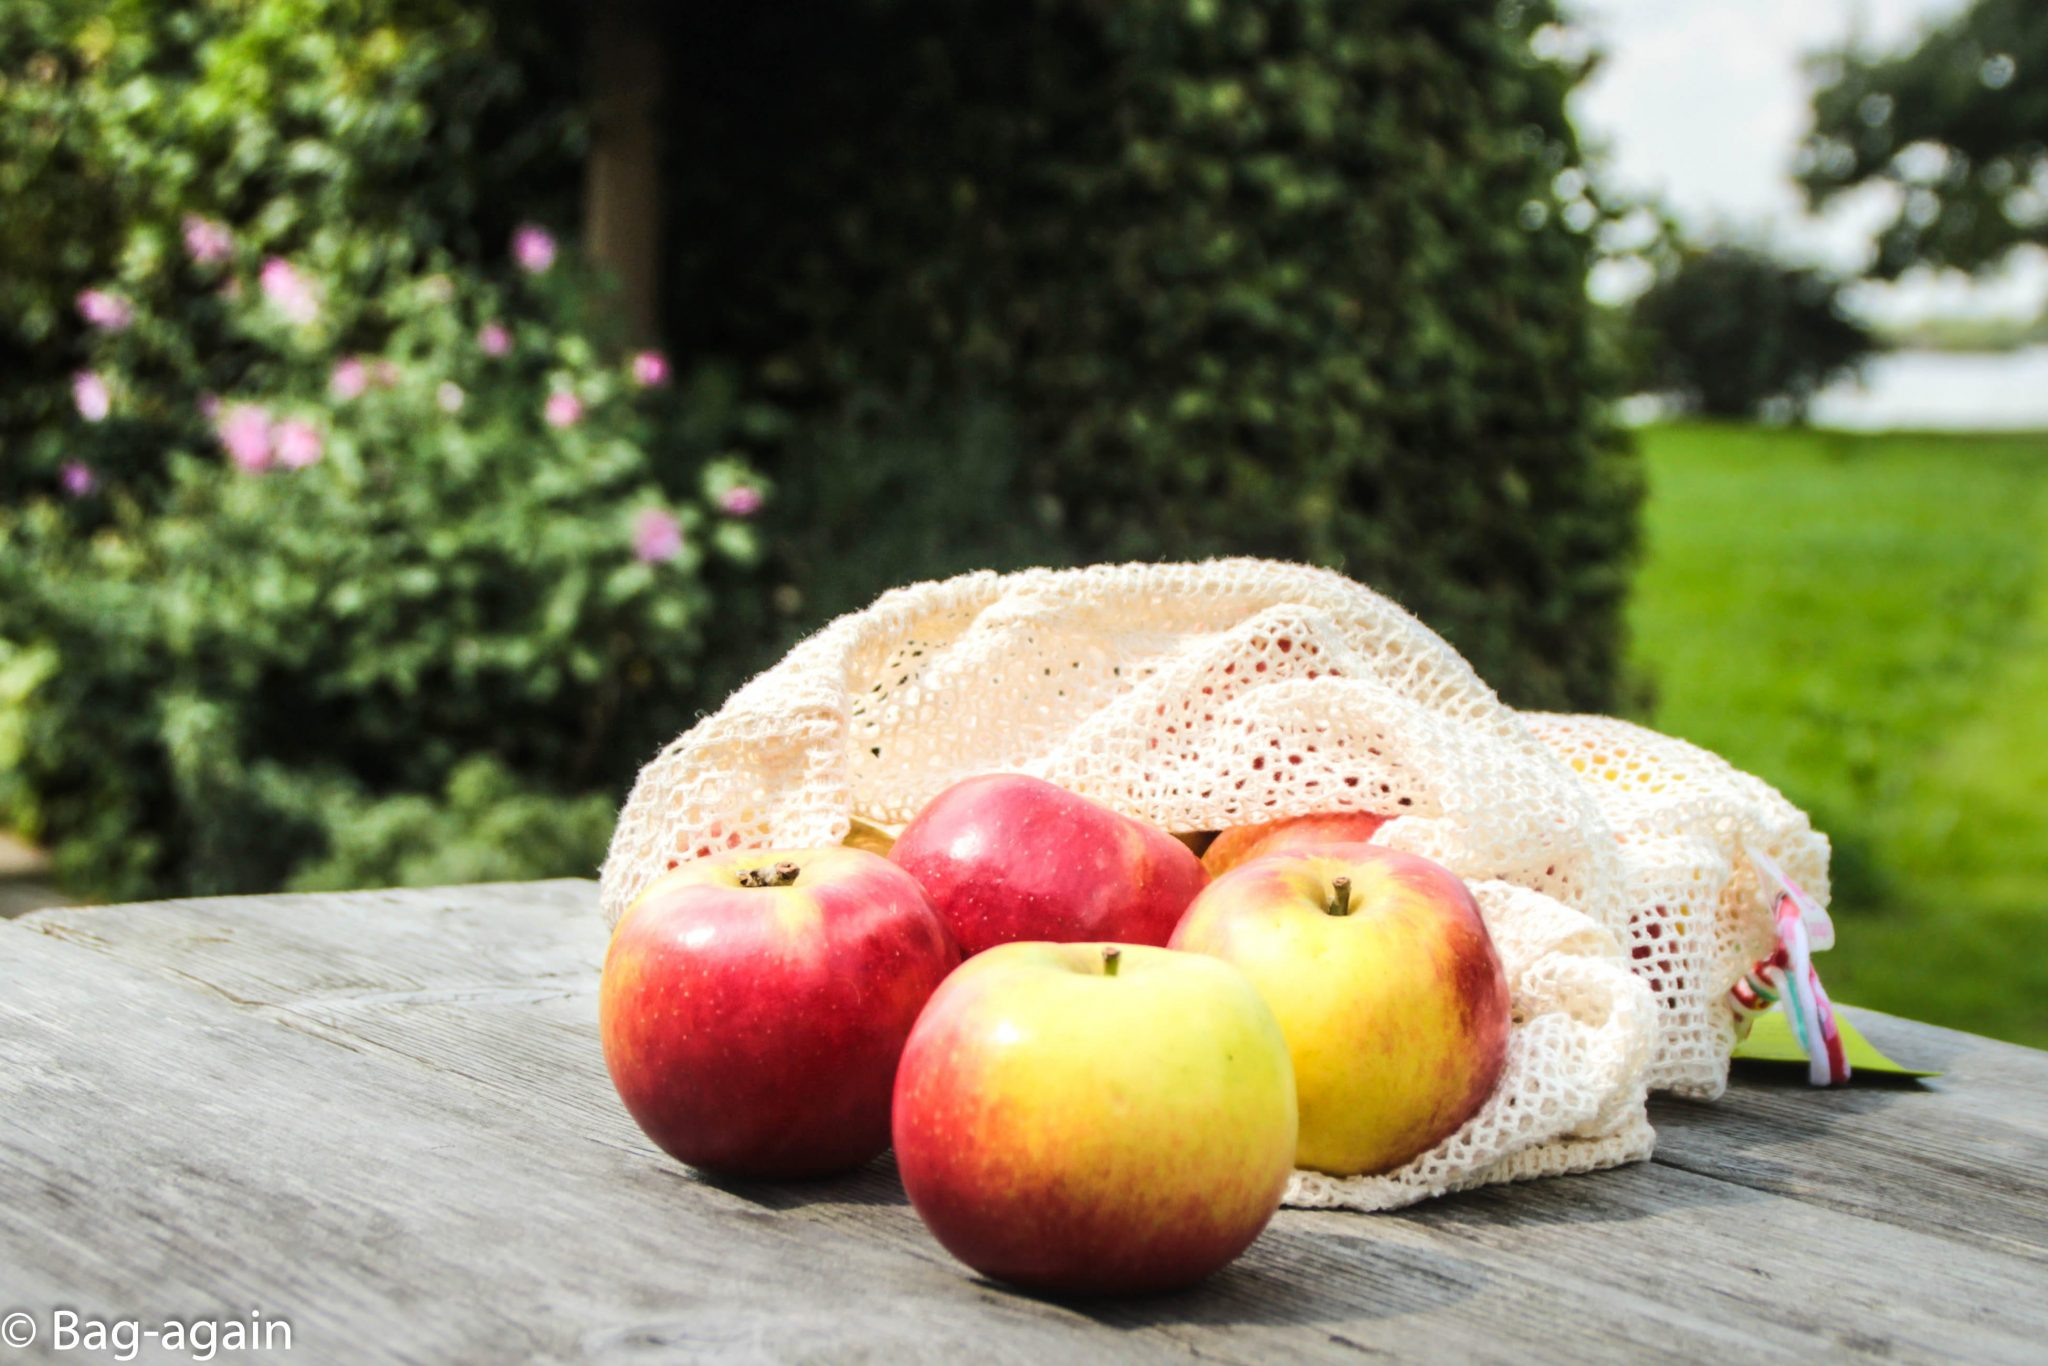 fruit en vegetable bag,, bag-again, zero waste, zero waste webshop, B2B, organic cotton, produce bag, GOTS